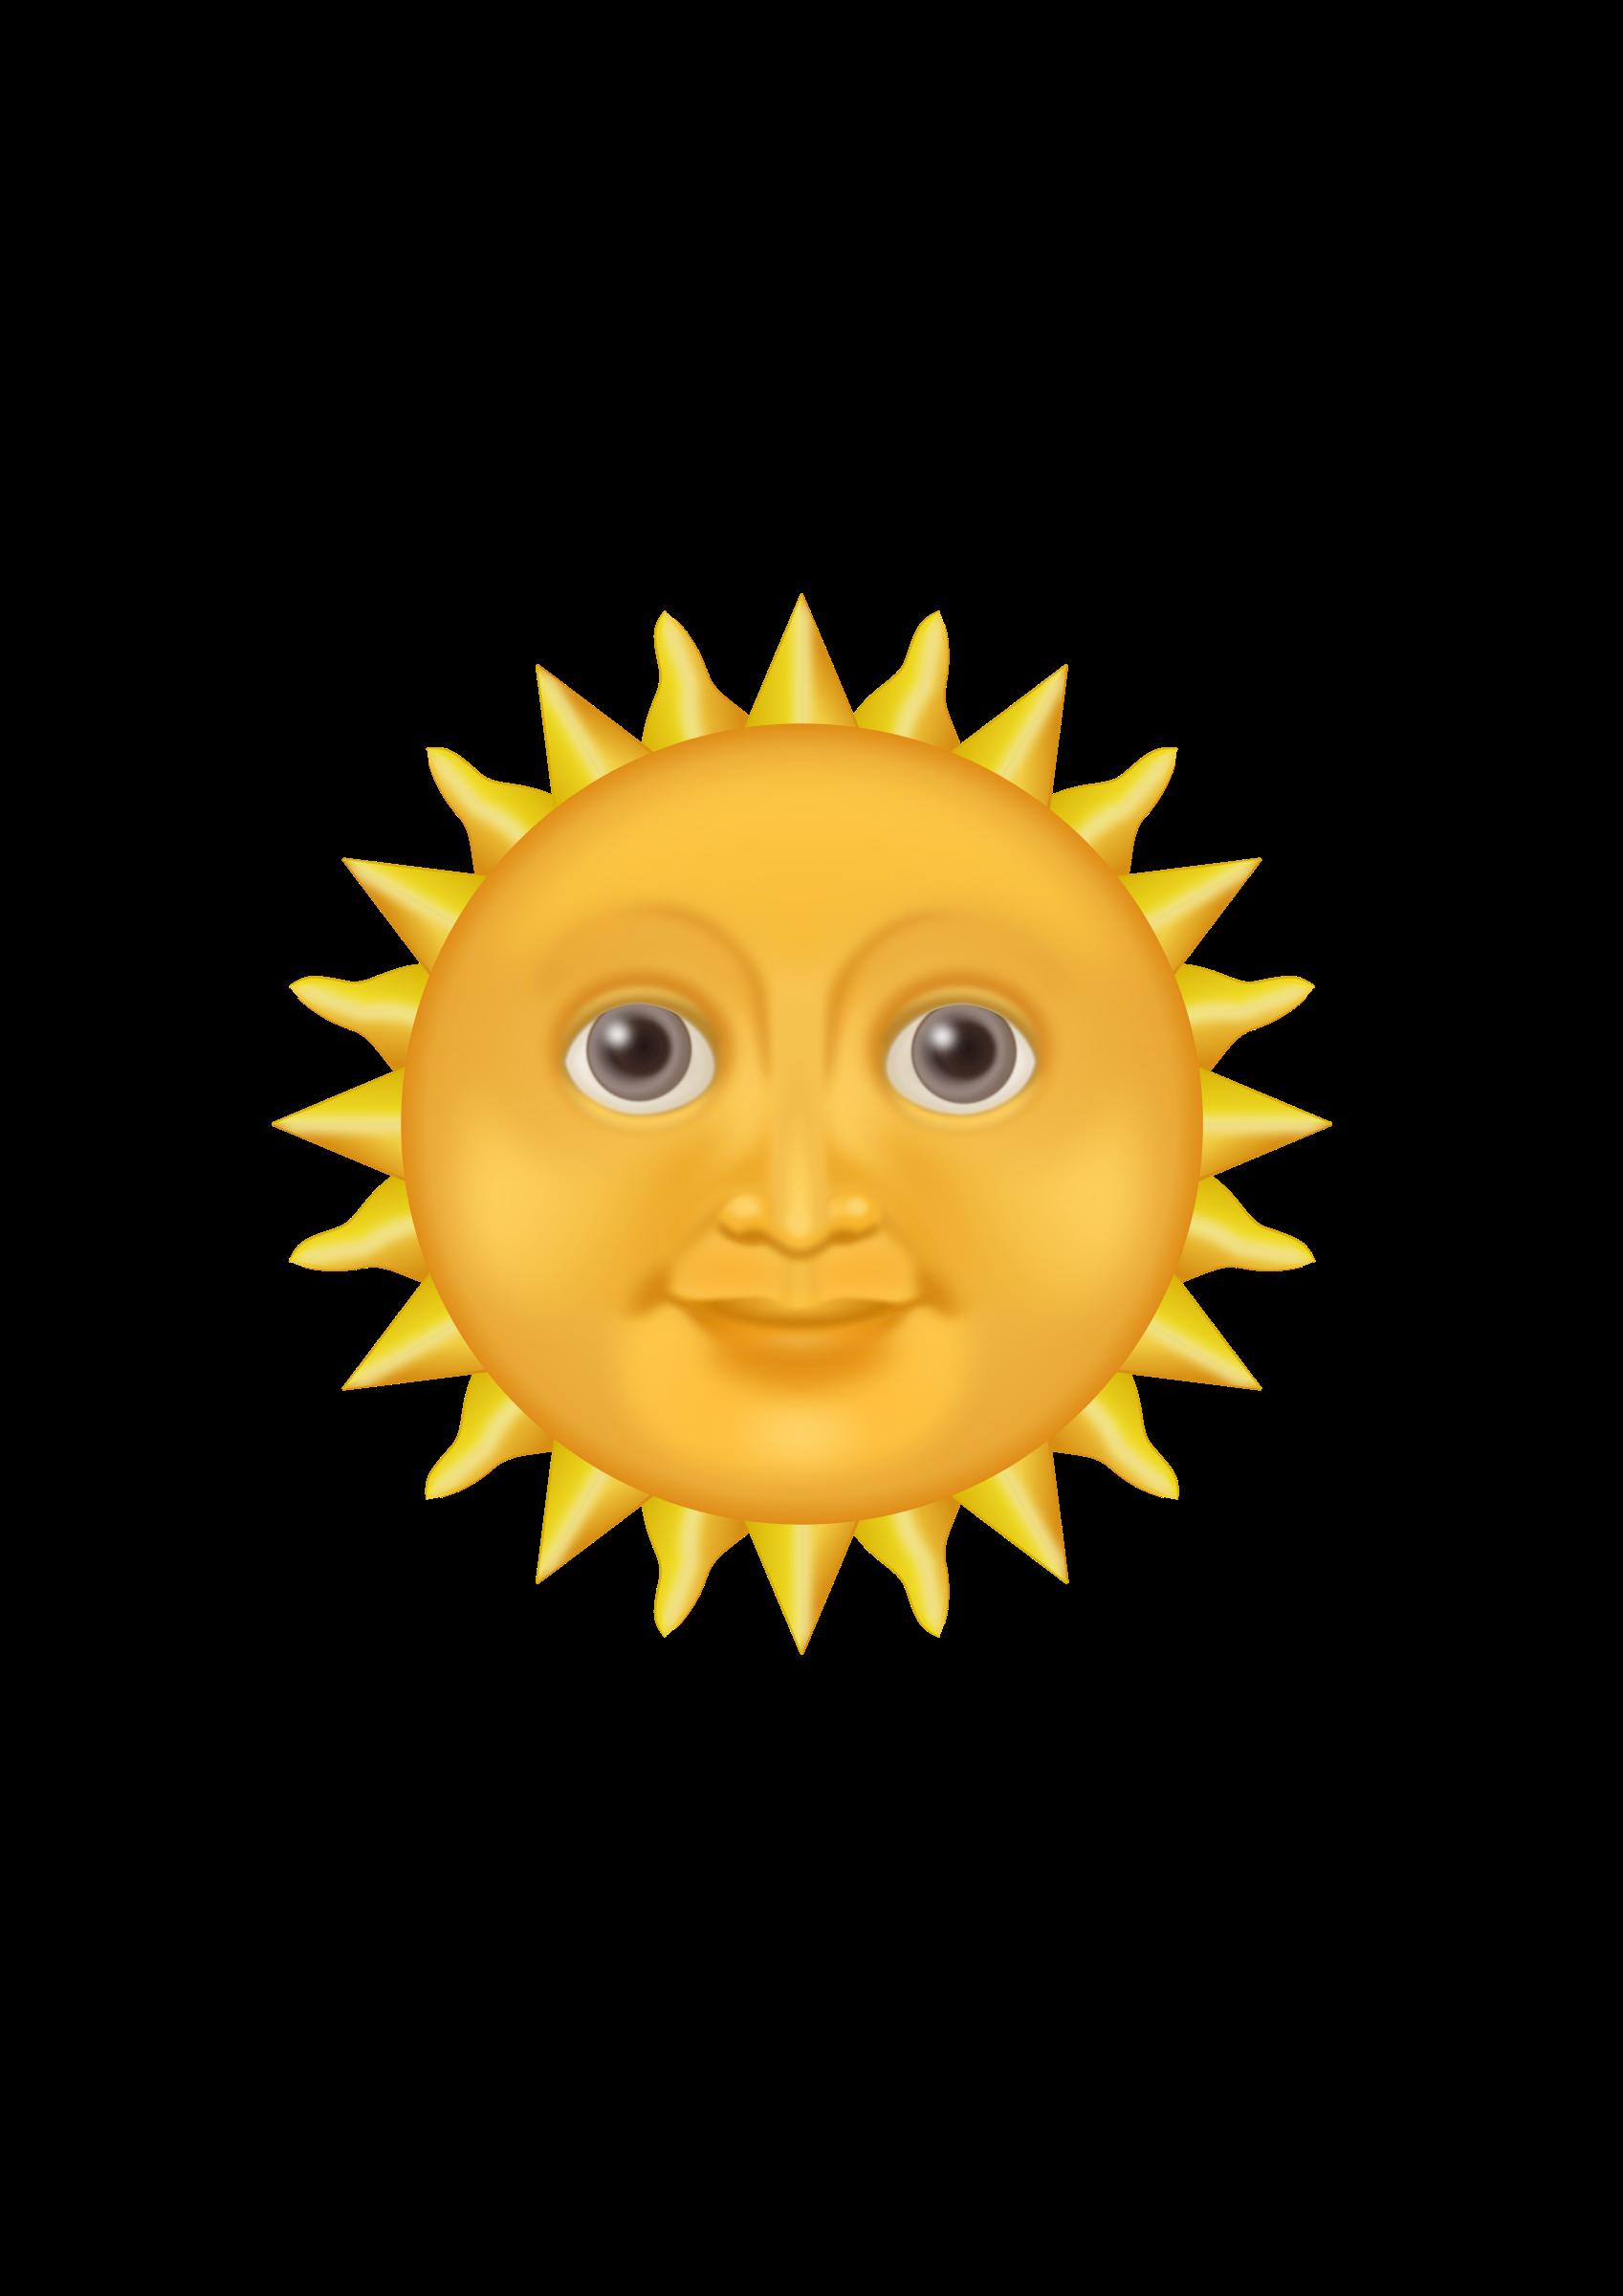 Clipart sun pdf. Emote big image png